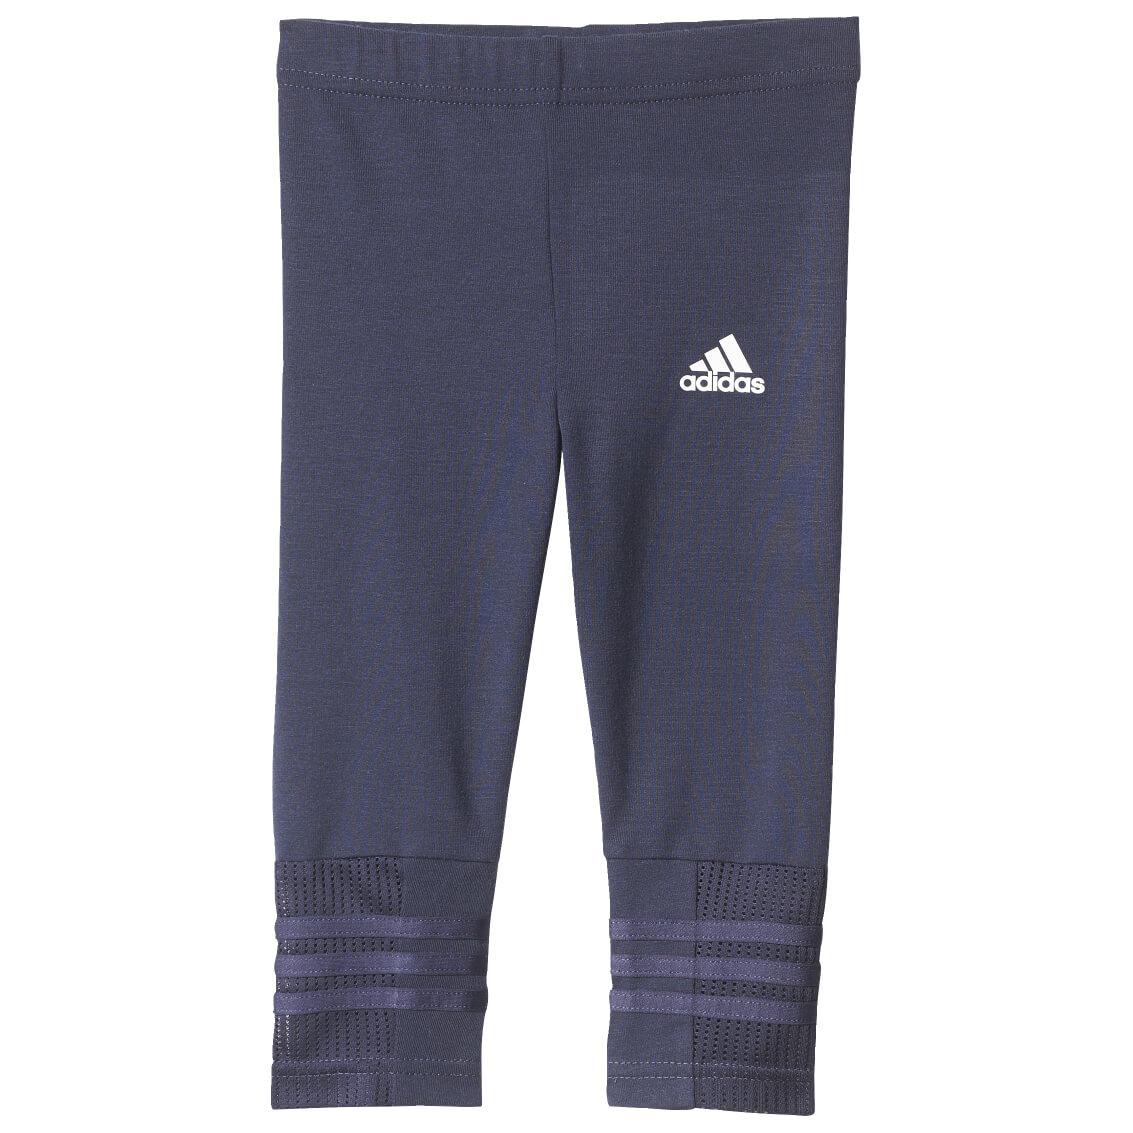 adidas pants near me